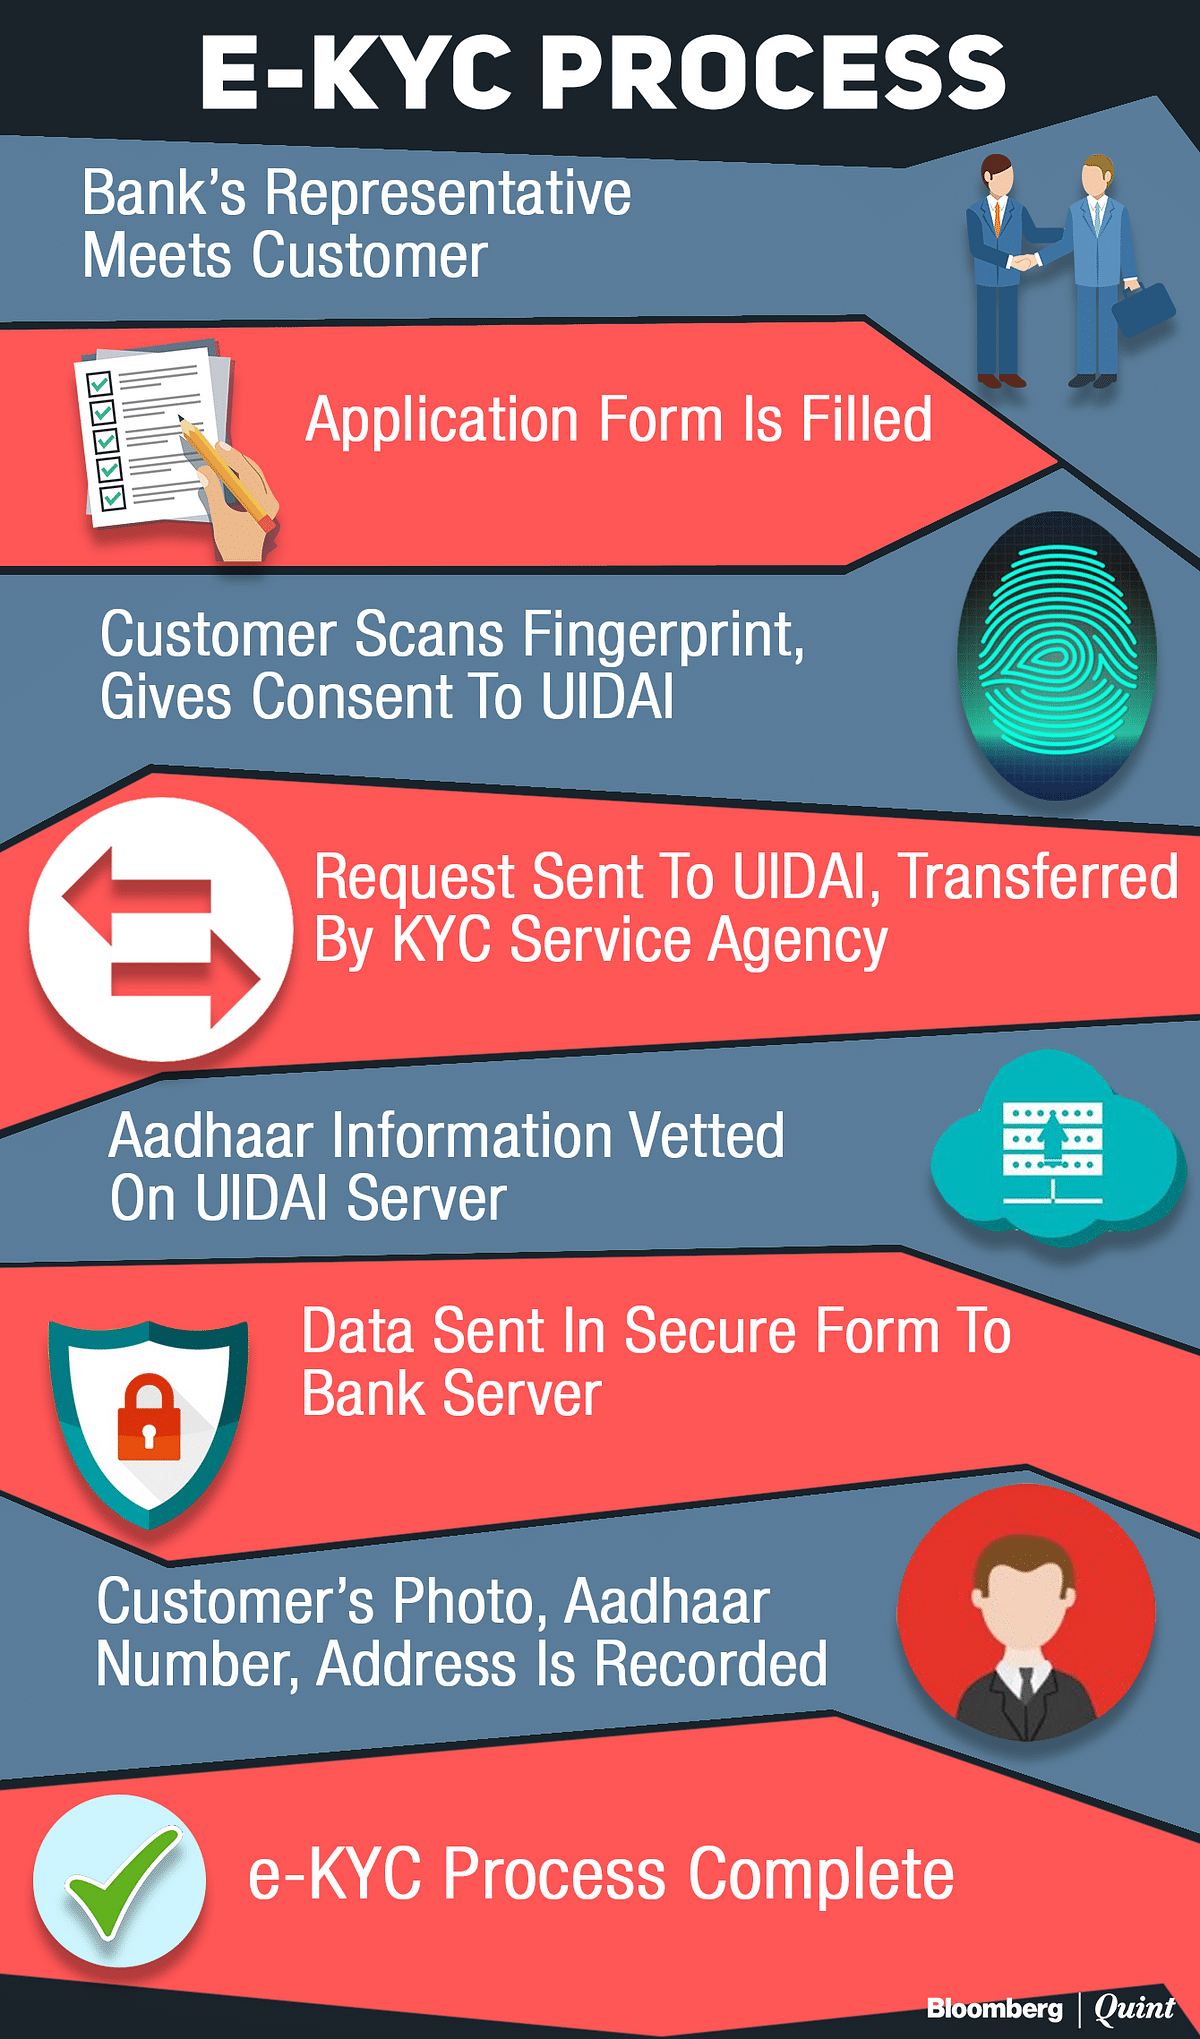 Fintech Tracker: Can e-KYC Service Providers Like Finahub Ride The Aadhaar Wave?